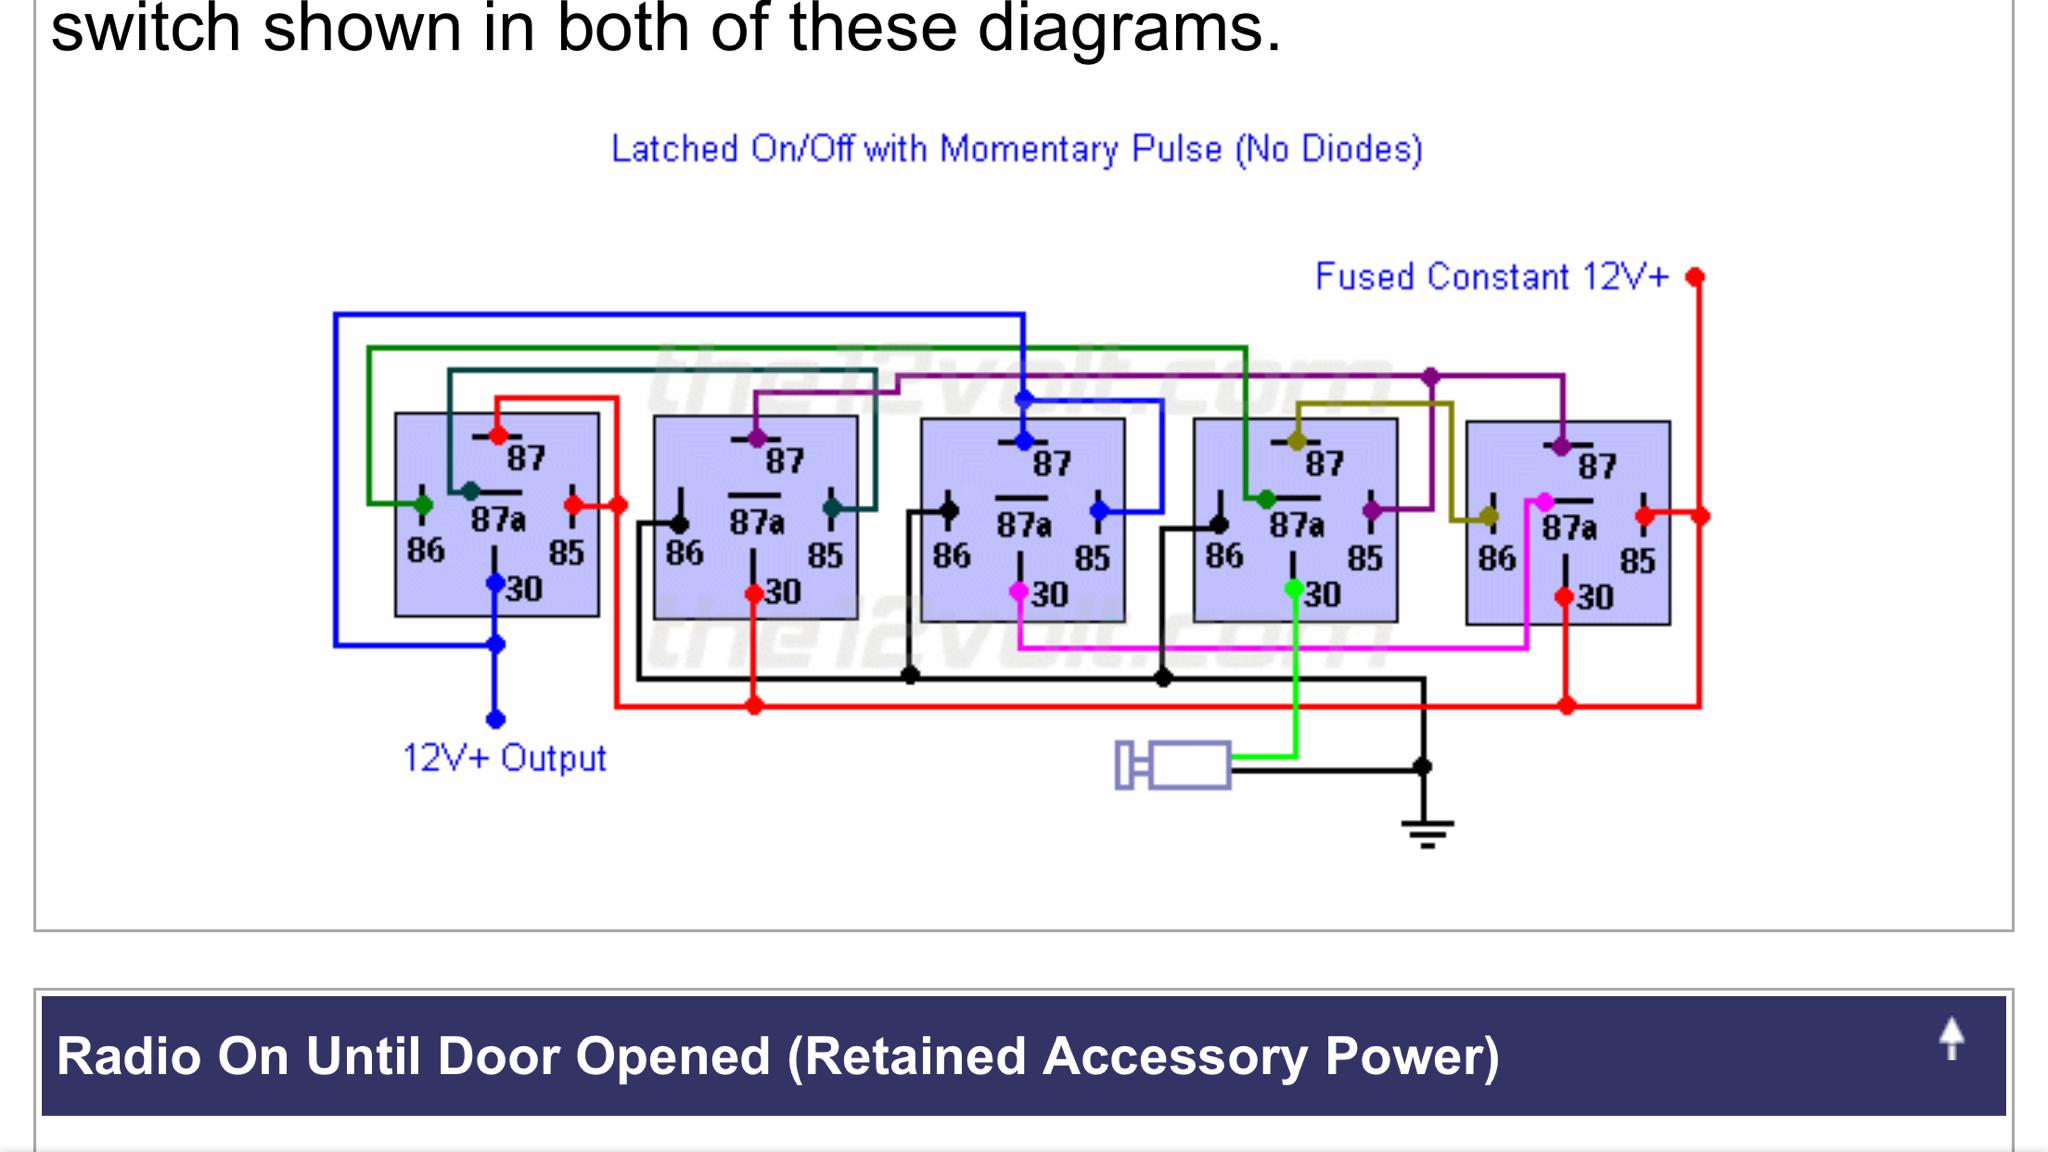 85 steering column wiring diagram ford truck 02 to 08 dash upgrade page 2 ford powerstroke diesel forum  ford powerstroke diesel forum